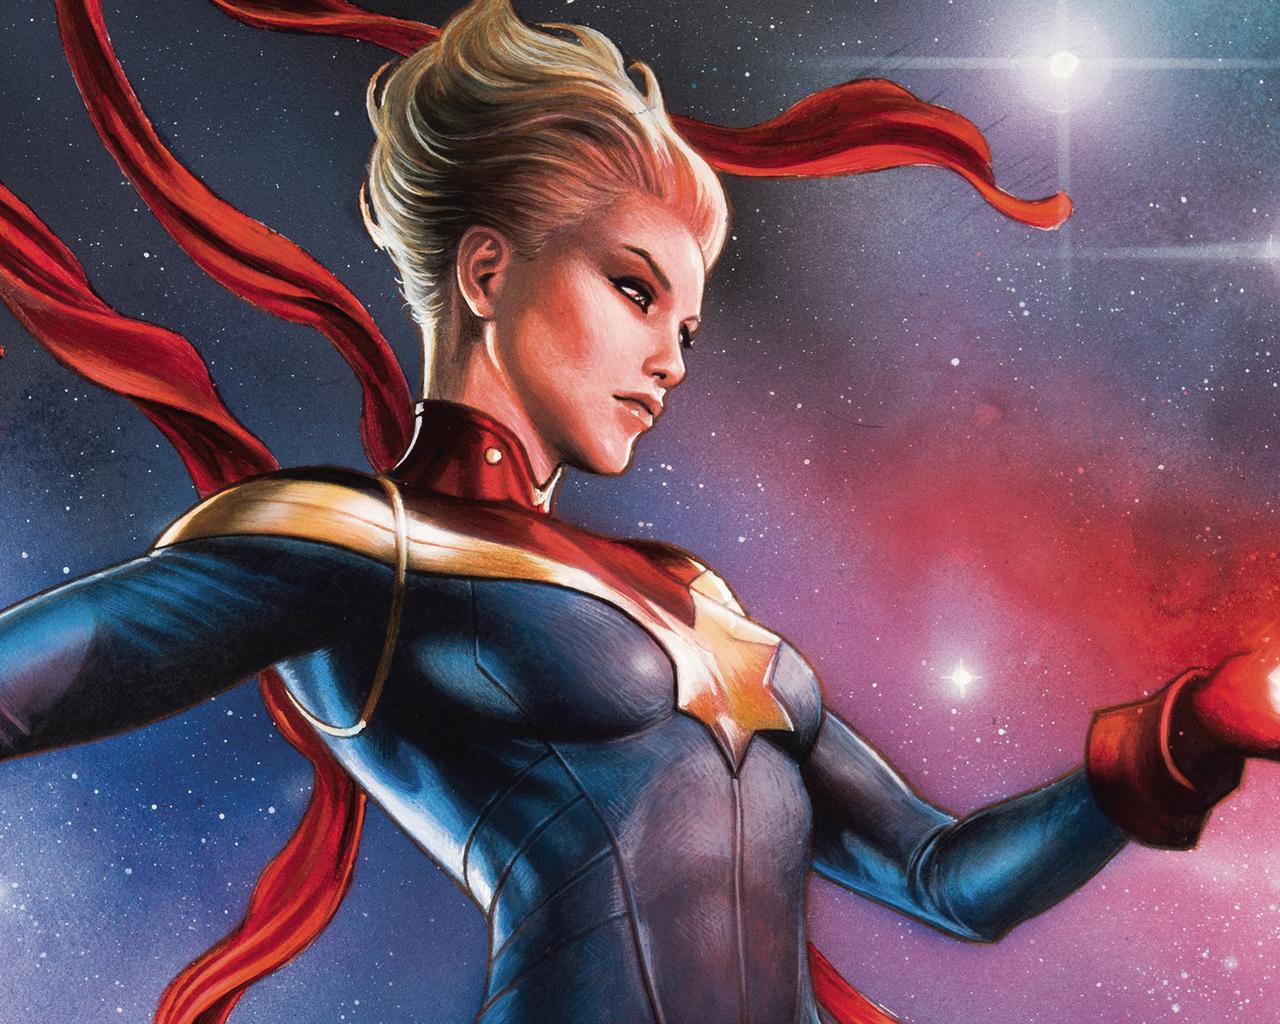 20x20 Captain Marvel Comic Book Art 20x20 Resolution HD 20k ...